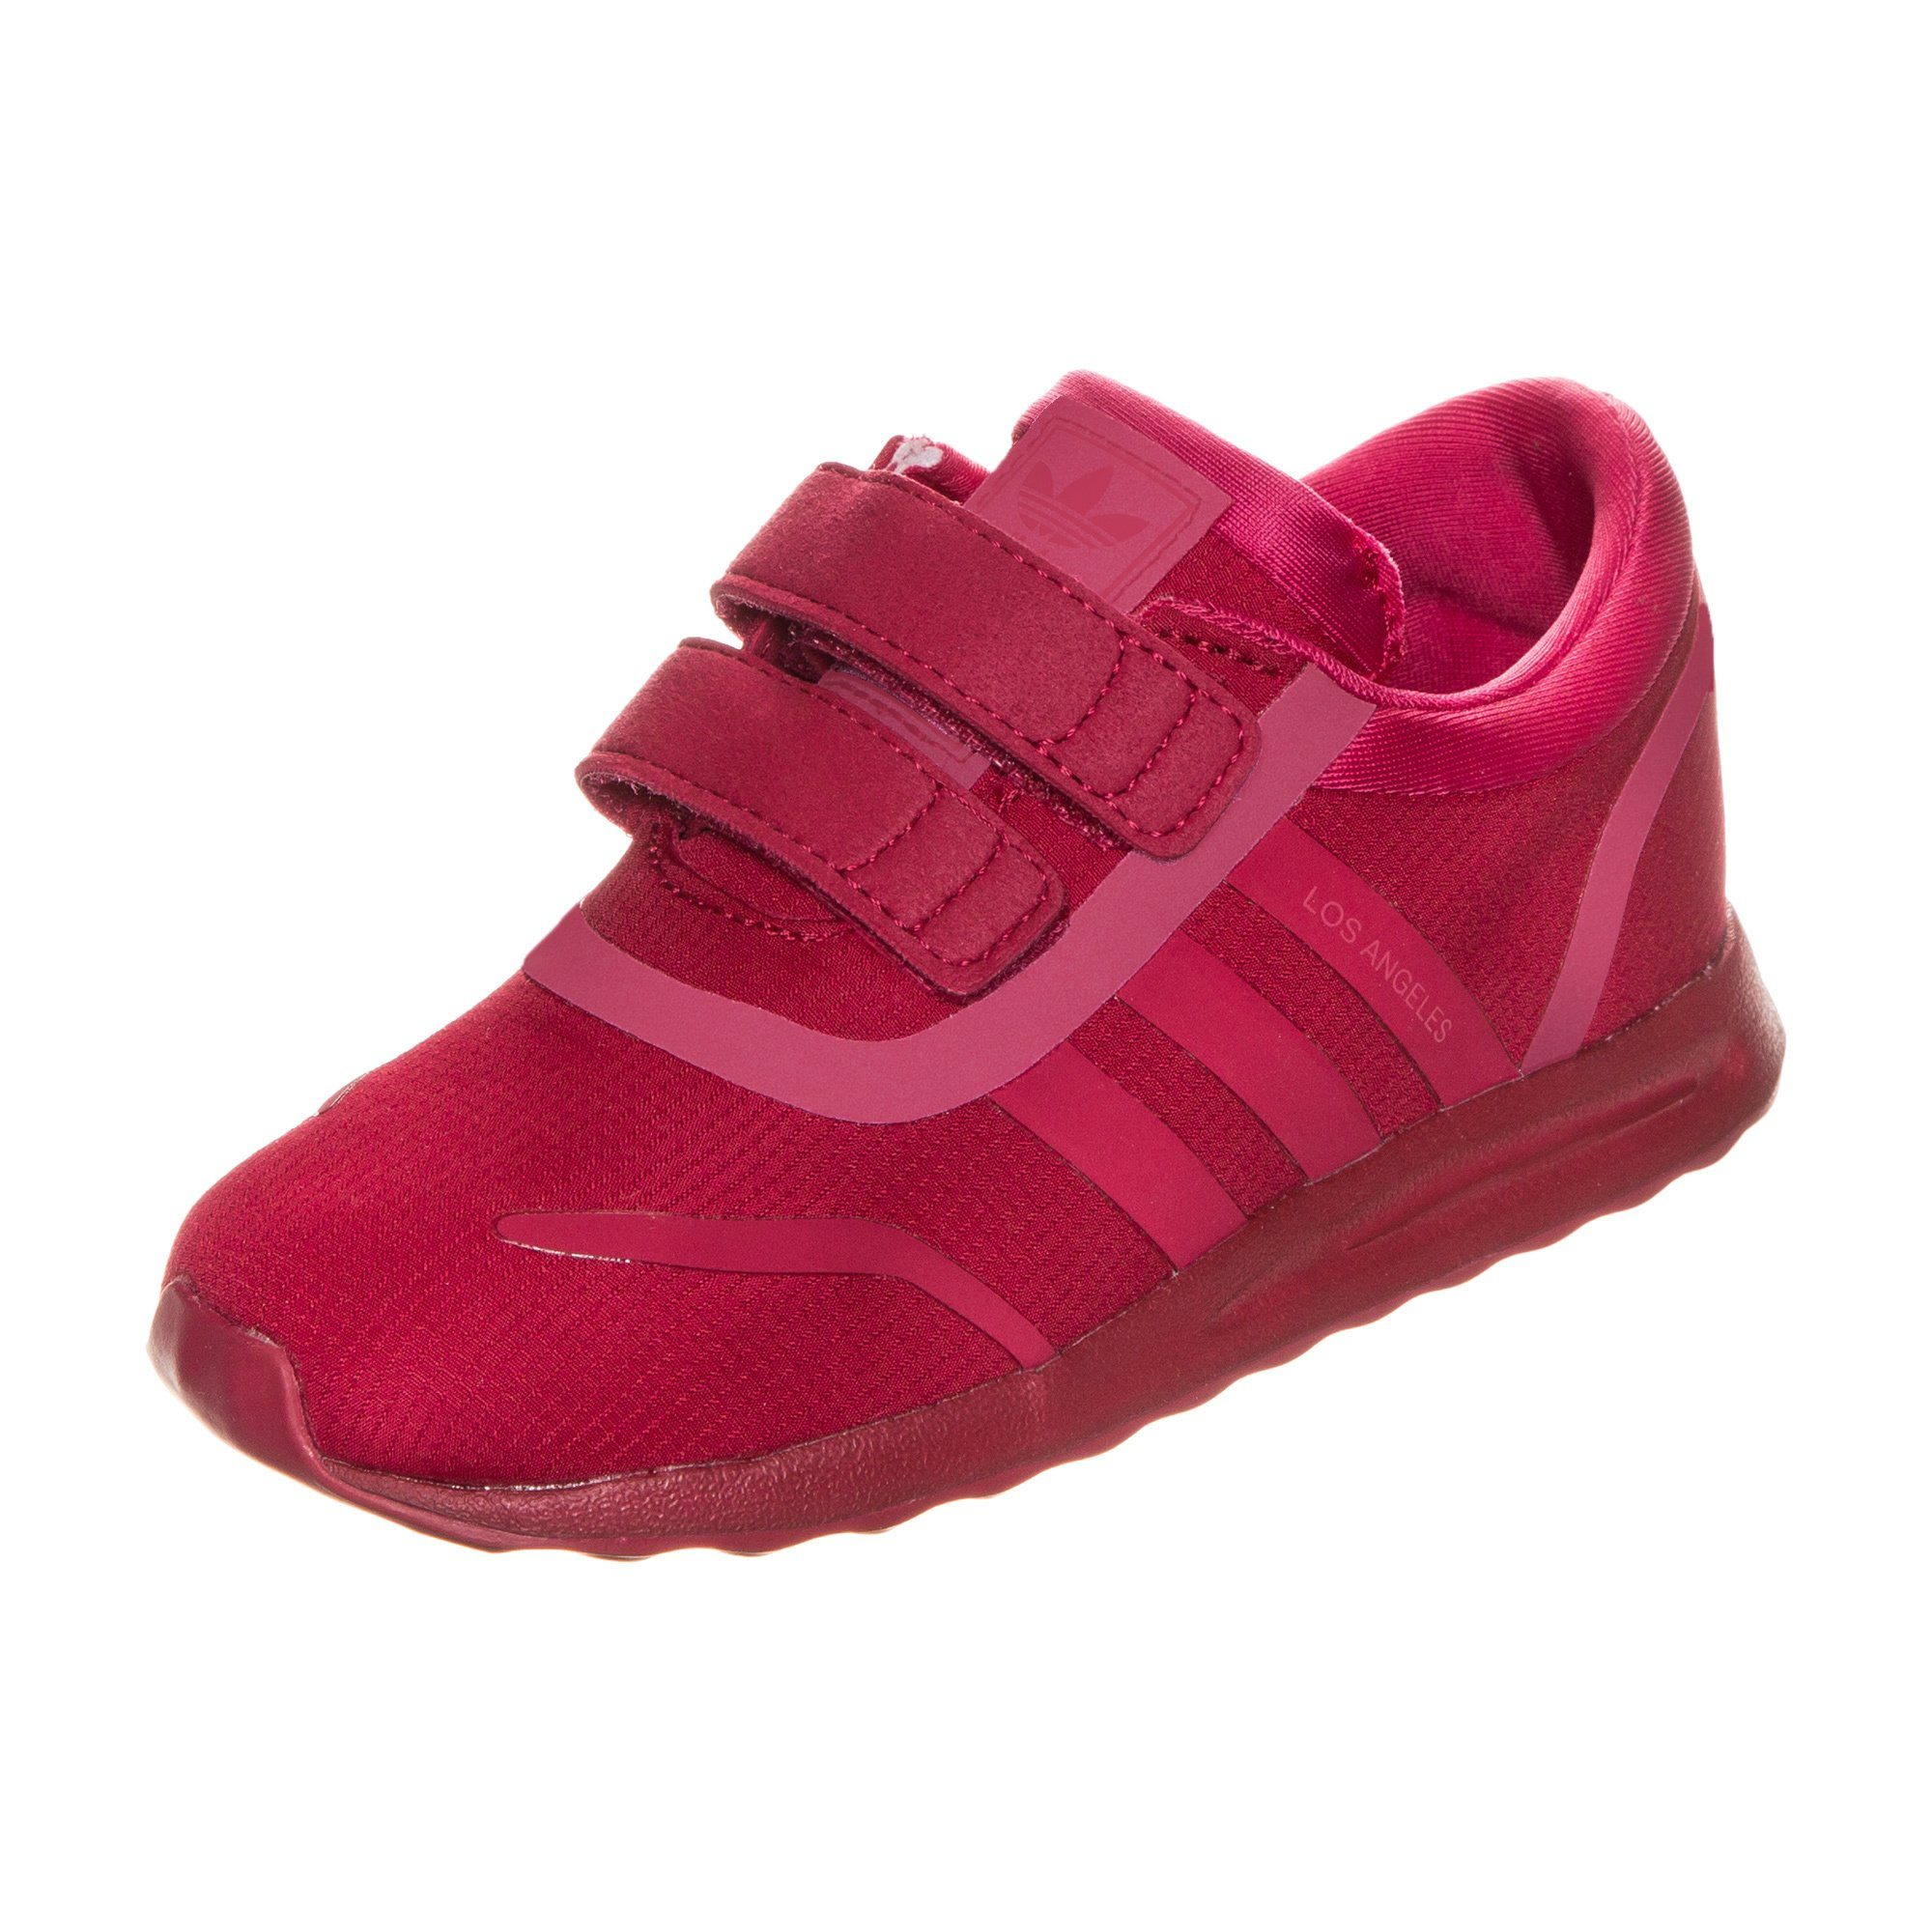 Image of adidas Originals Los Angeles CF Sneaker Kleinkinder